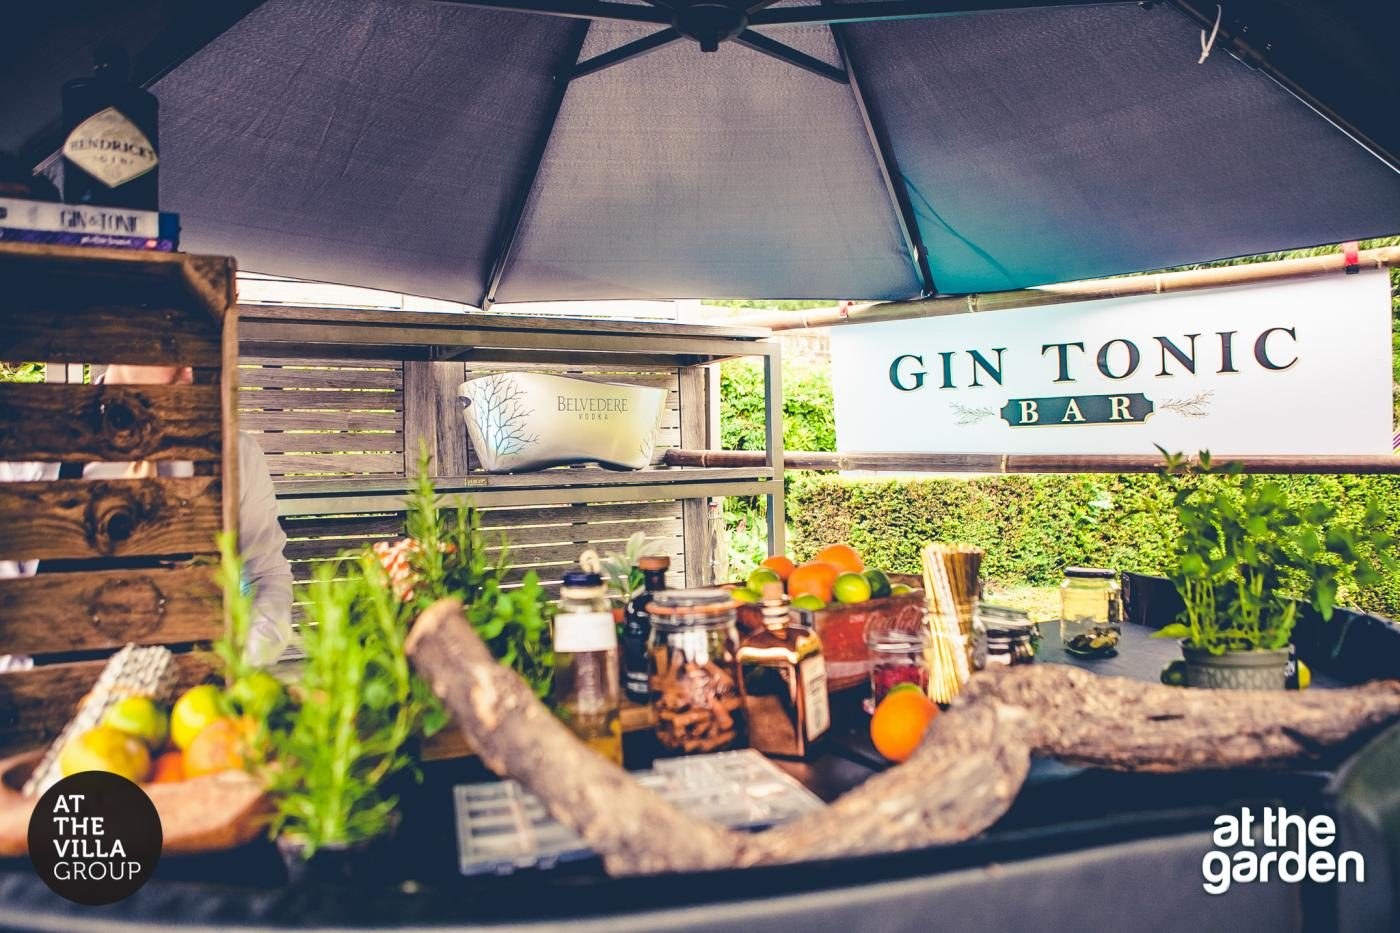 Gin Tonic Bar Horecare Evenement organiseren personeel Maastricht Limburg Valkenburg Heuvelland Sittard Geleen Heerlen Parkstad